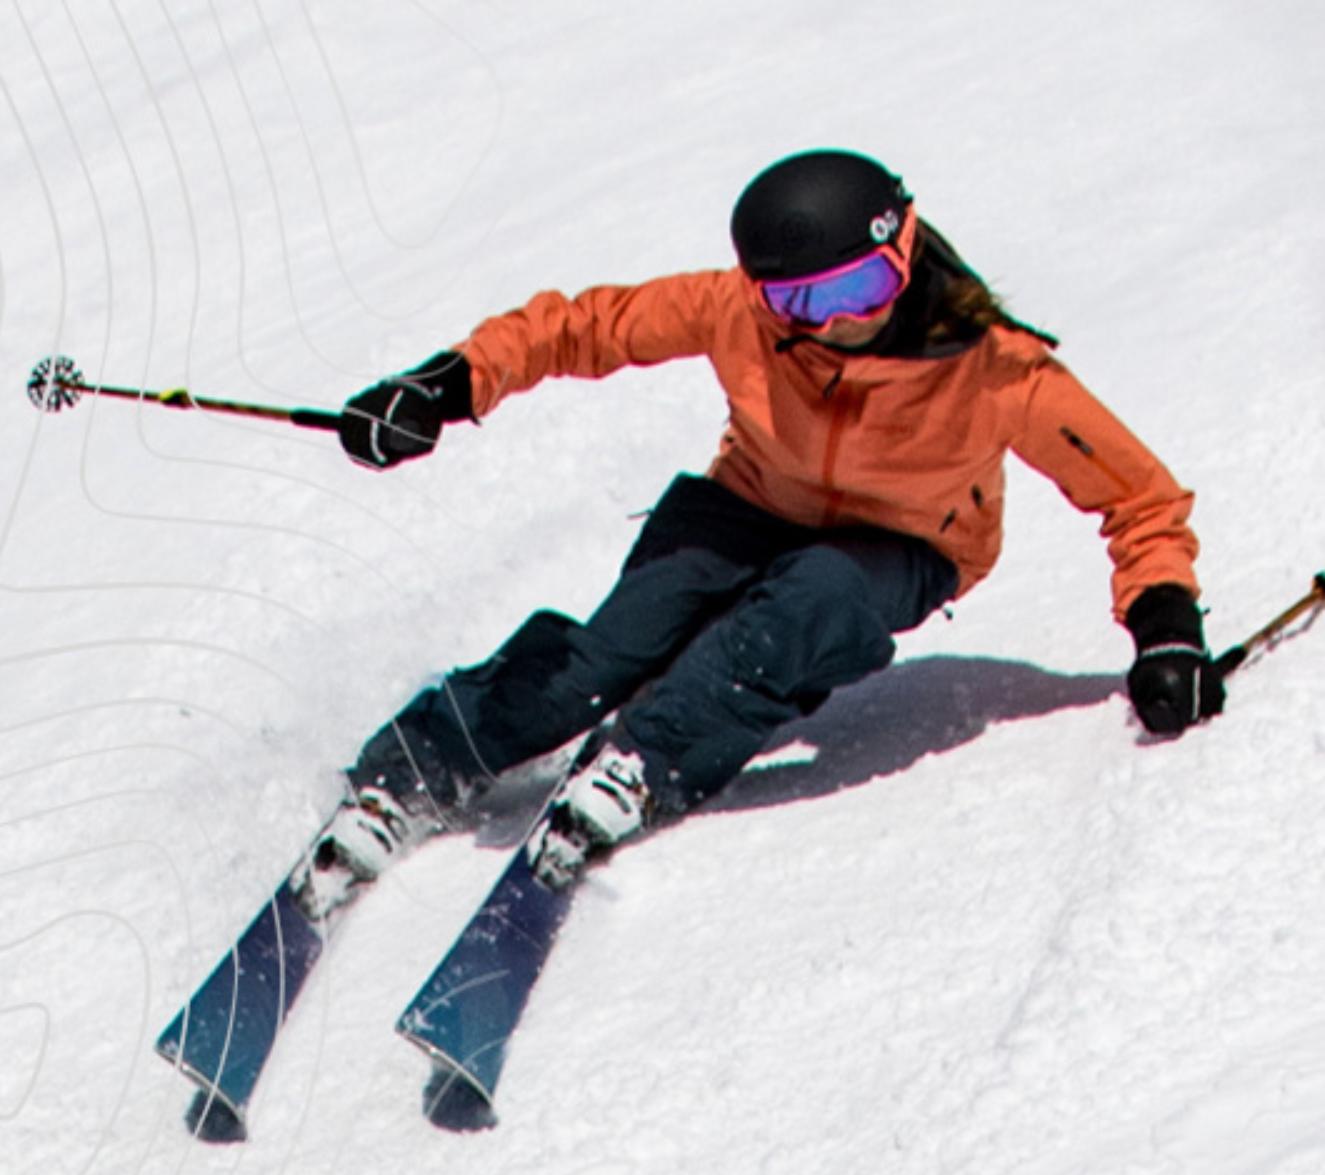 Sun & Ski Sports: Up to 40% Off Peak Season Sale